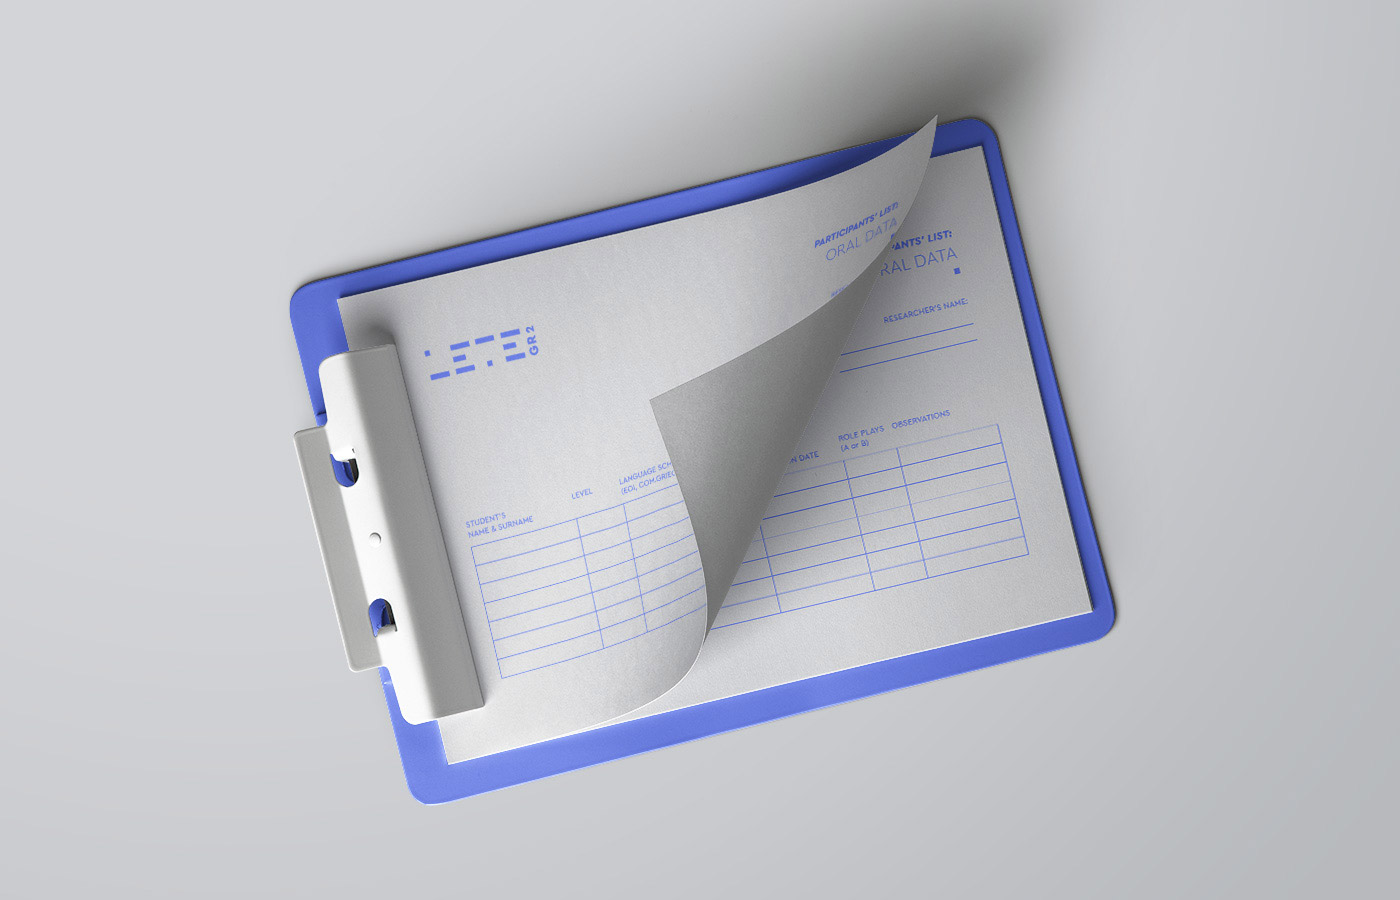 learning teaching greek research university logo design branding stationary paper folder clip